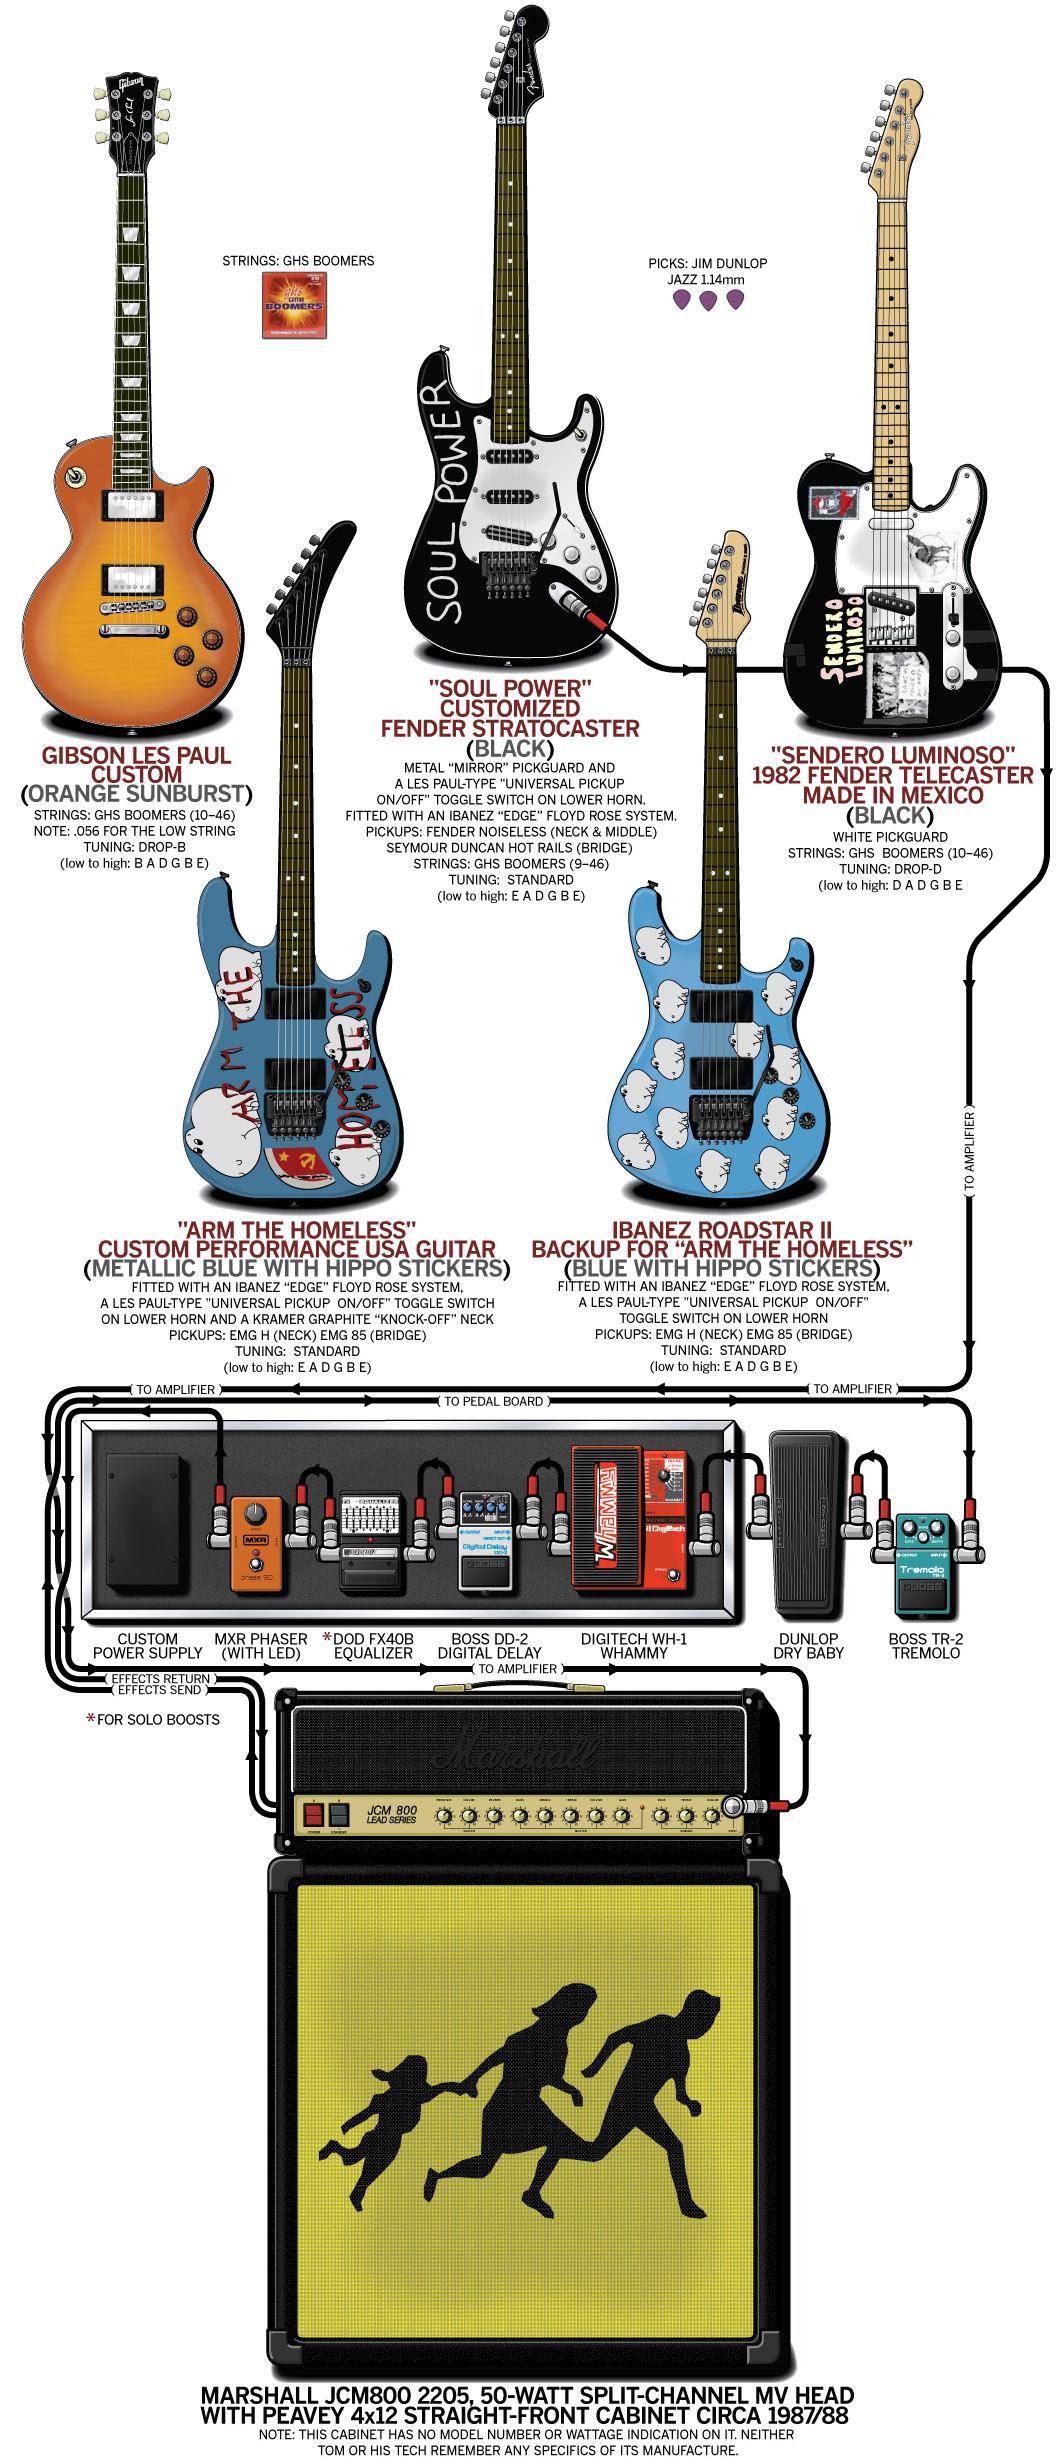 tom morello u0026 39 s guitar gear  pedalboard  u0026 amps